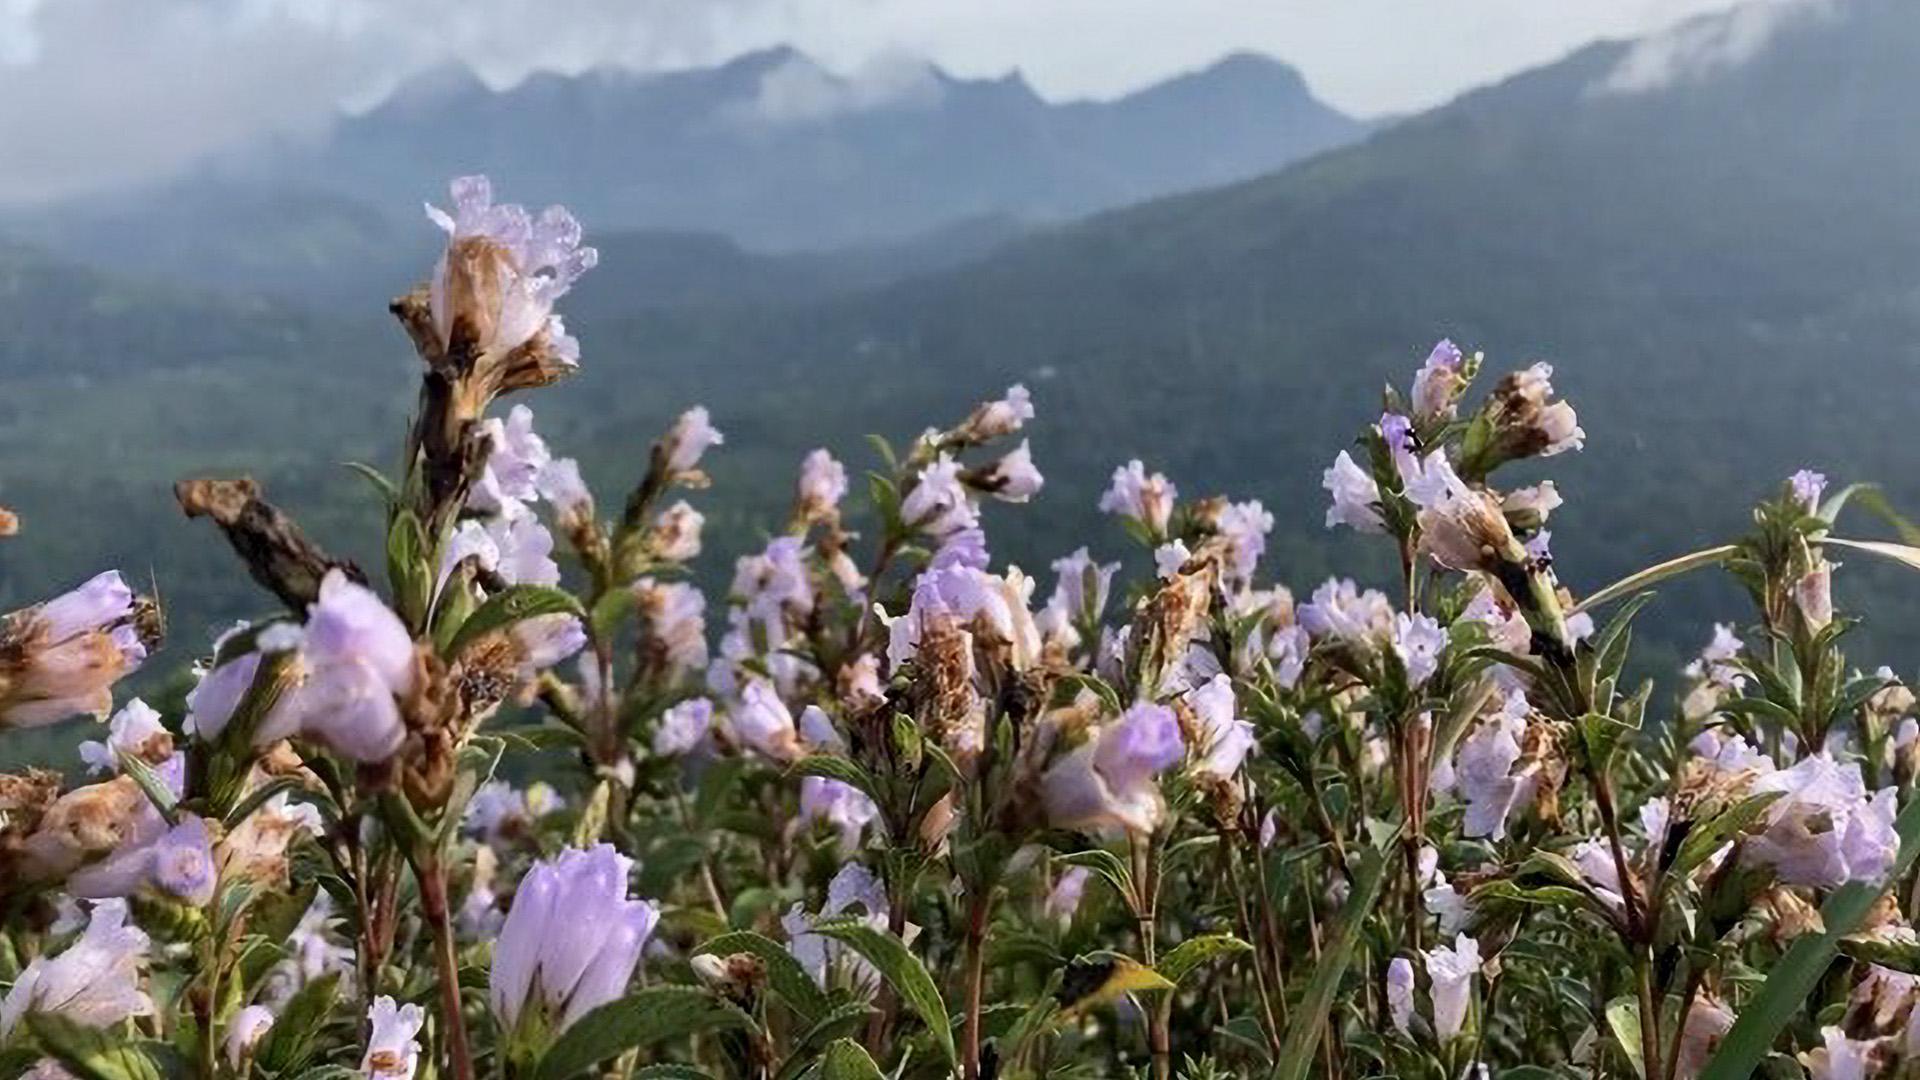 Neelakurinji Flowers Blossom In India After 12 Years